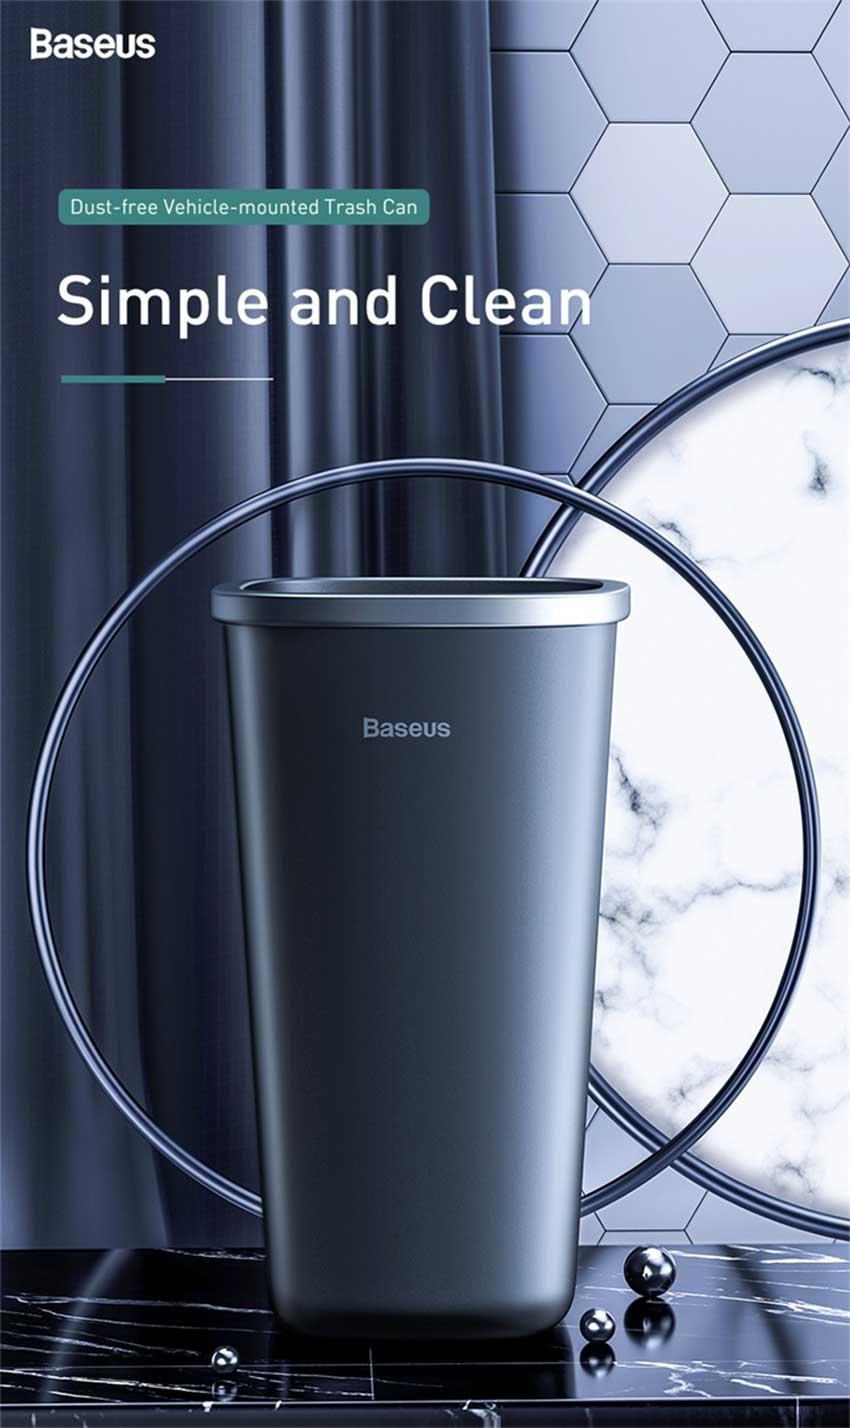 Baseus-Dust-Free-Trash-Can-800ml_5.jpg?1